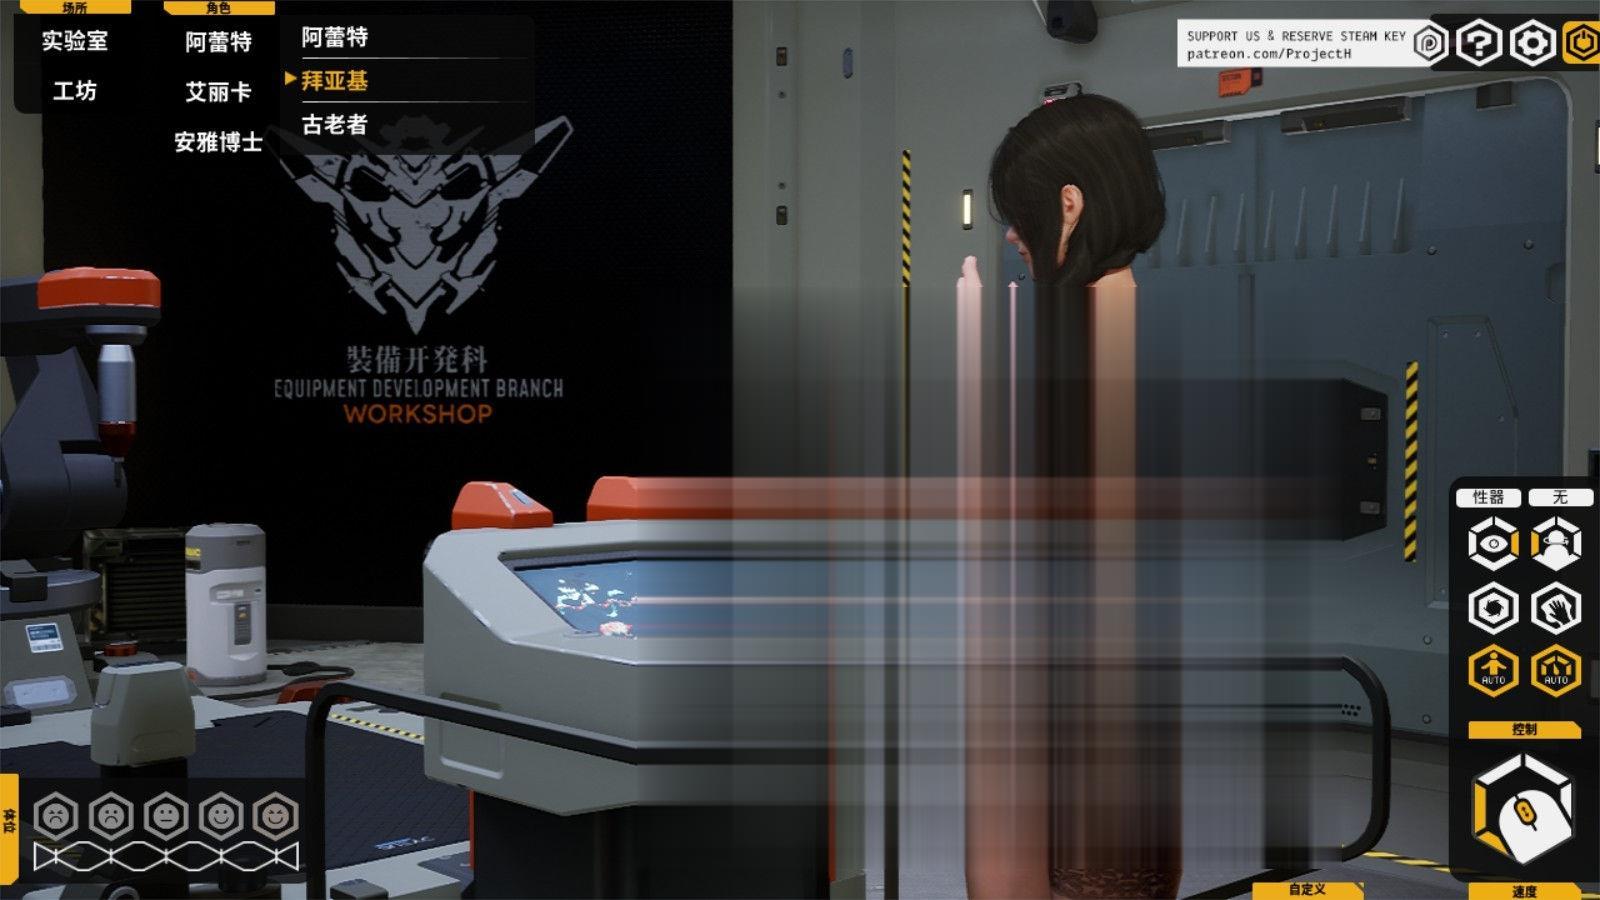 【3D互动/中文/全动态】堕落玩偶:爱O欲行动 V0.32 官中步兵版+动画【更新/超多H/30G】-爱游·幻想